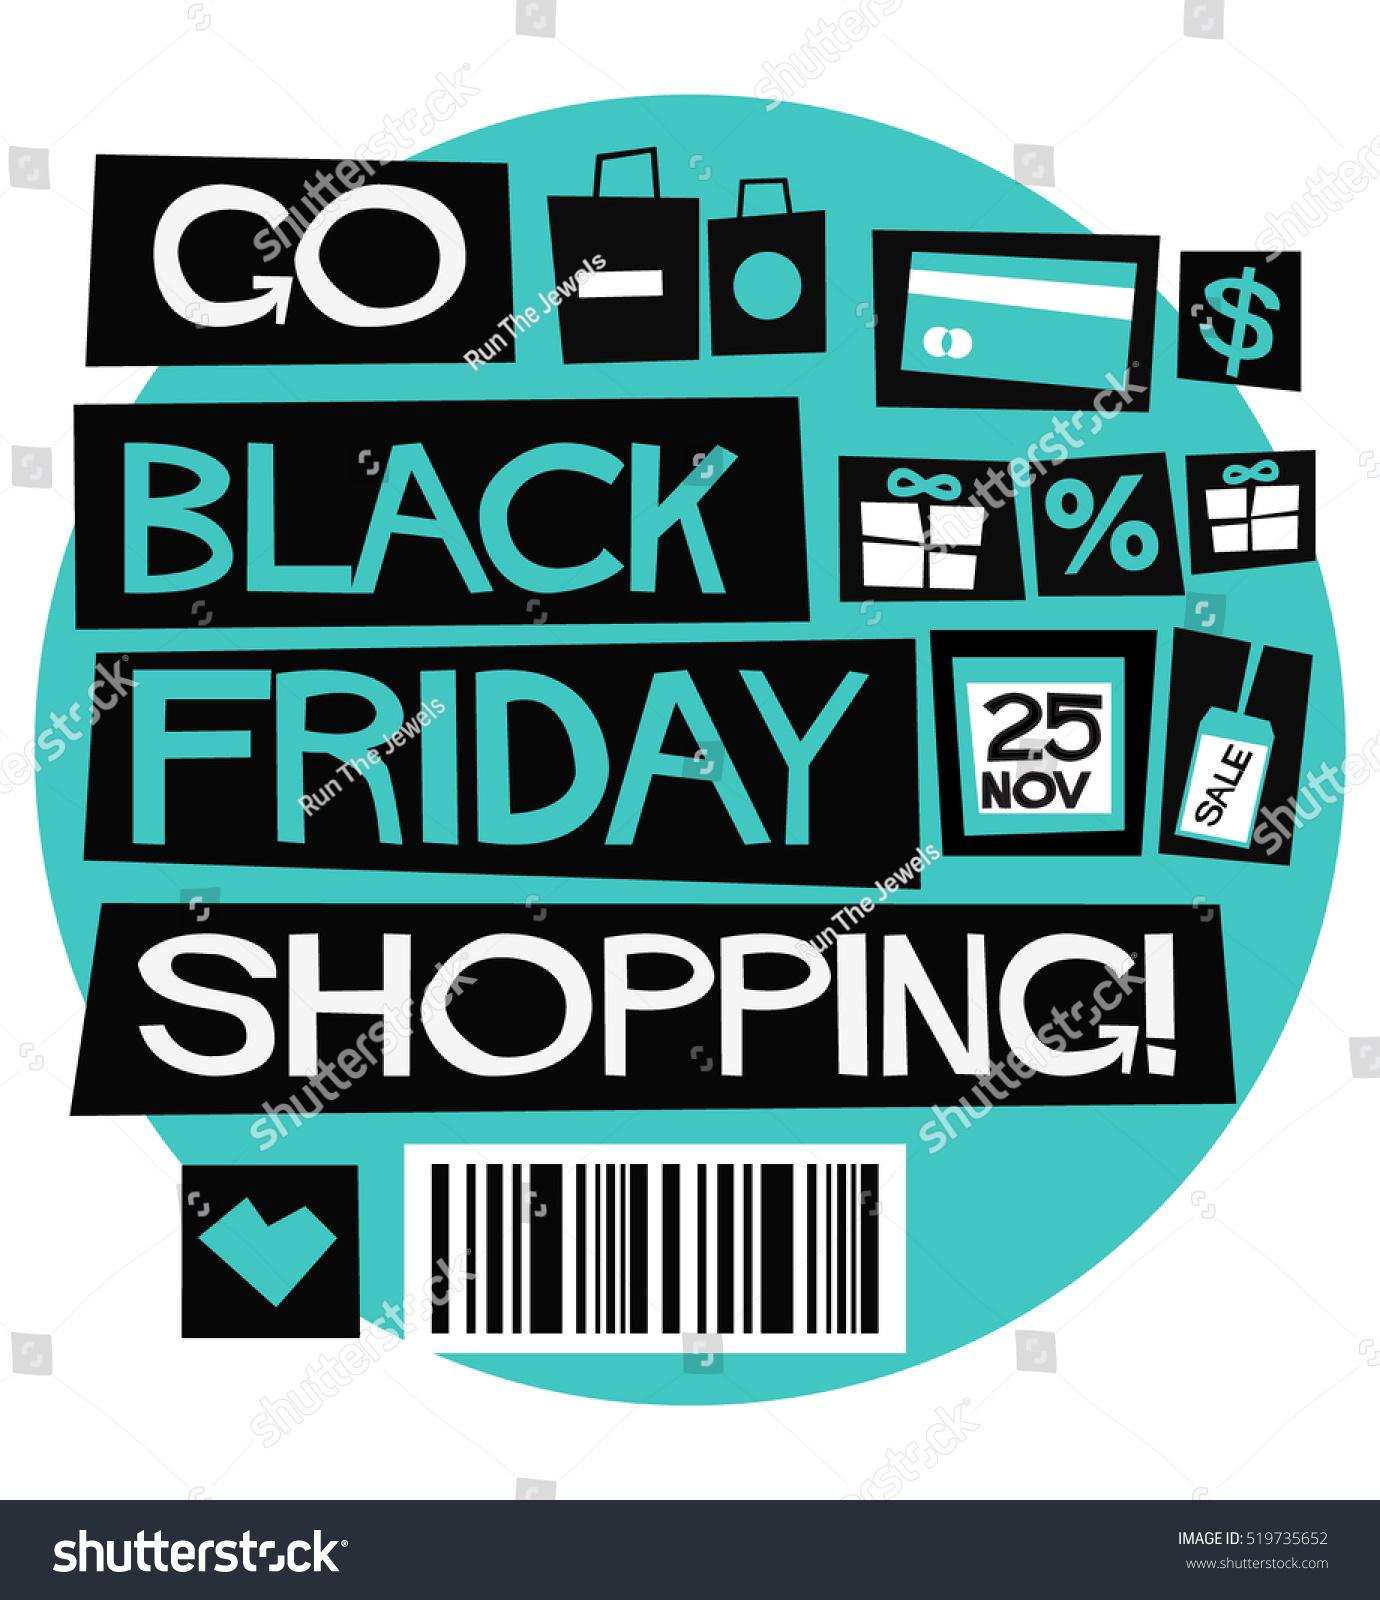 go black friday shopping flat style stock vector 519735652 shutterstock. Black Bedroom Furniture Sets. Home Design Ideas